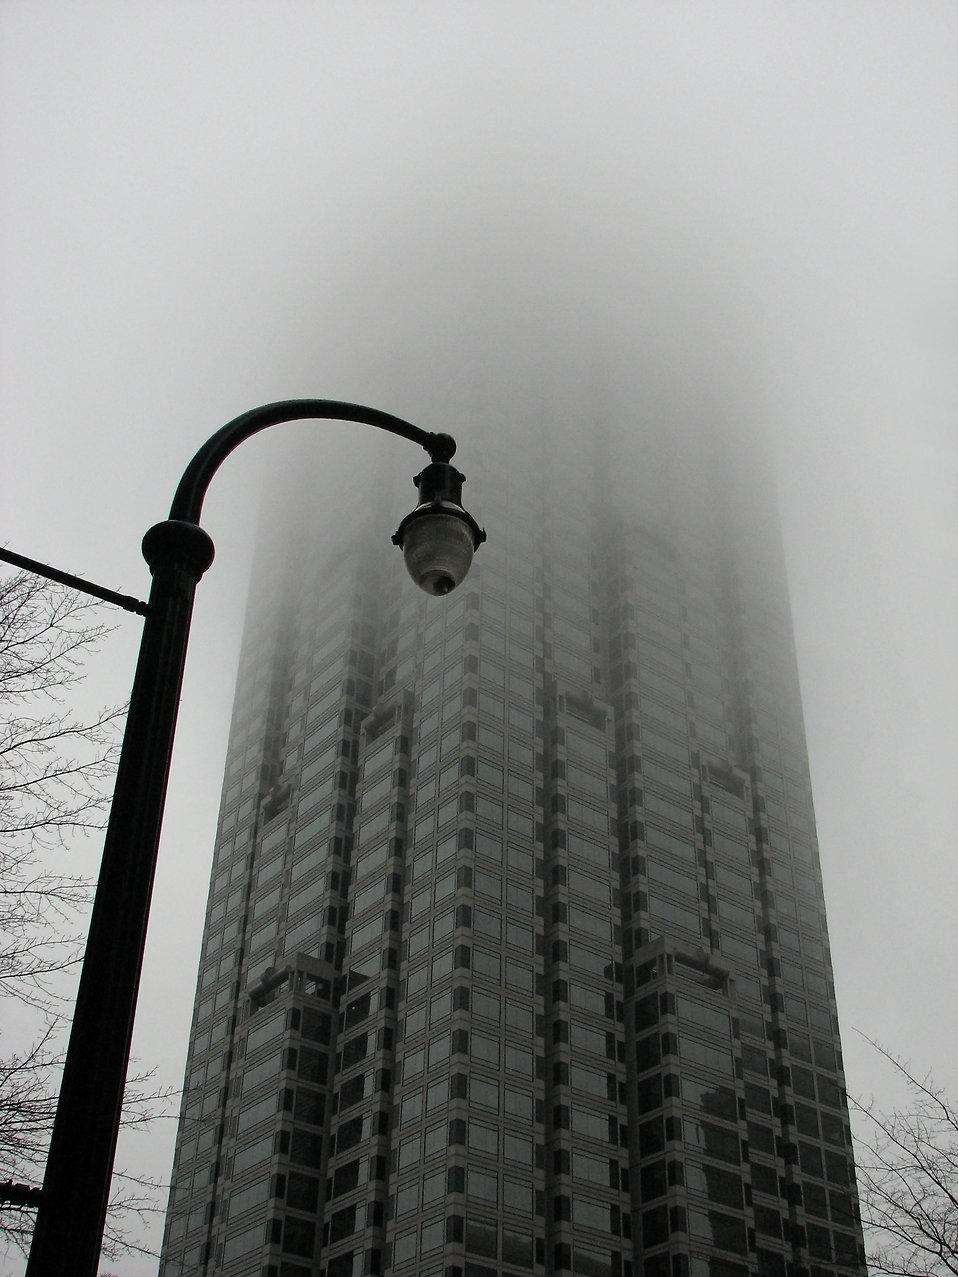 A skyscraper covered in fog : Free Stock Photo